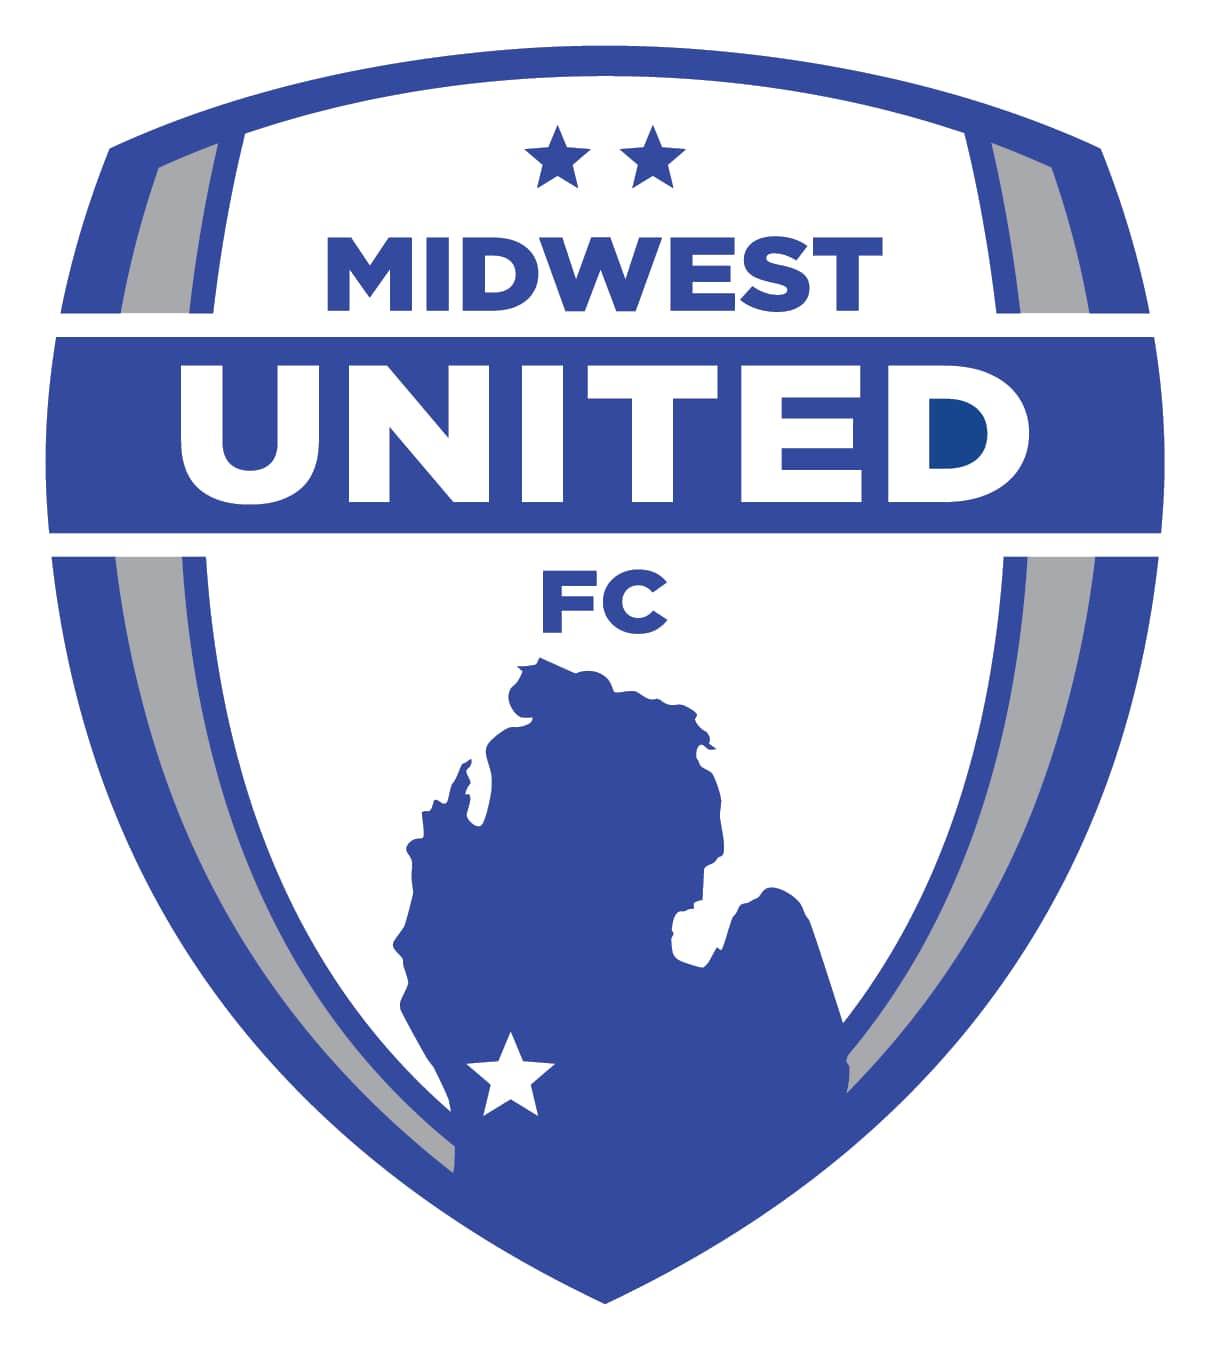 Midwest United FC 04 Royal - AR